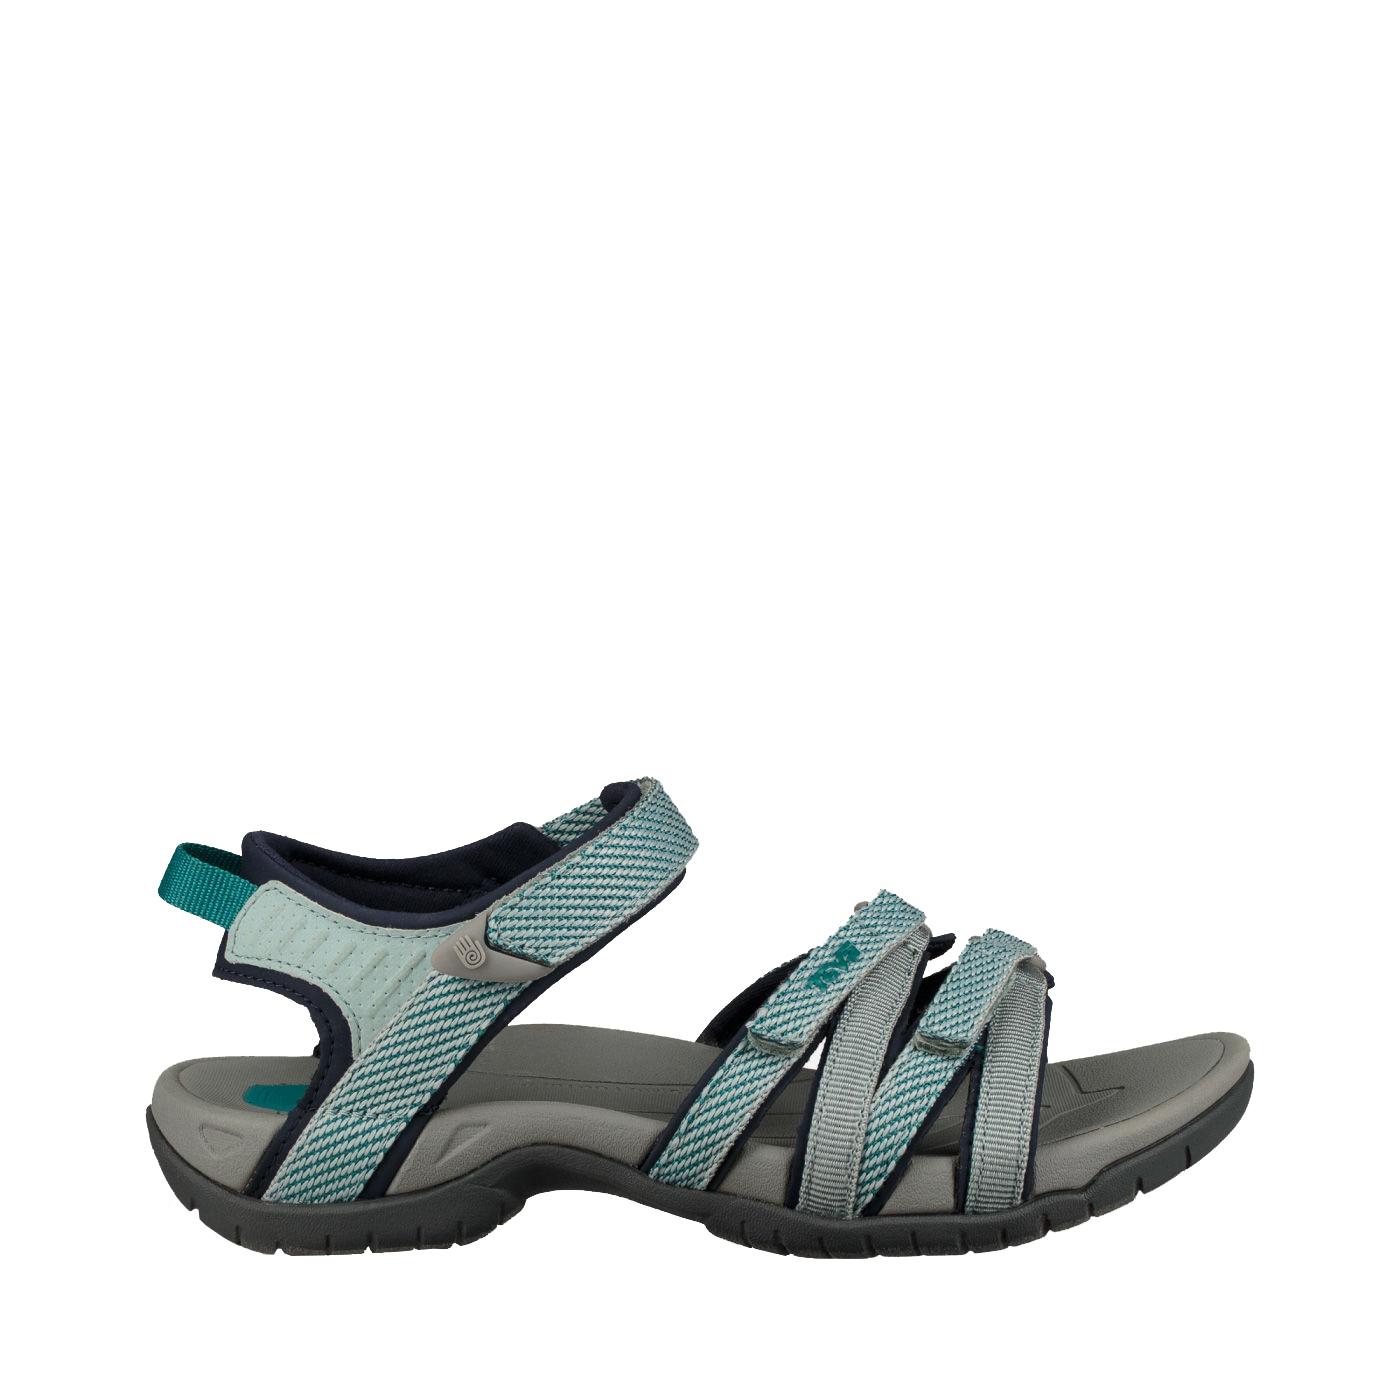 Teva W Tirra - Damesandal - Hera Gray Mist | Shoes and overlays